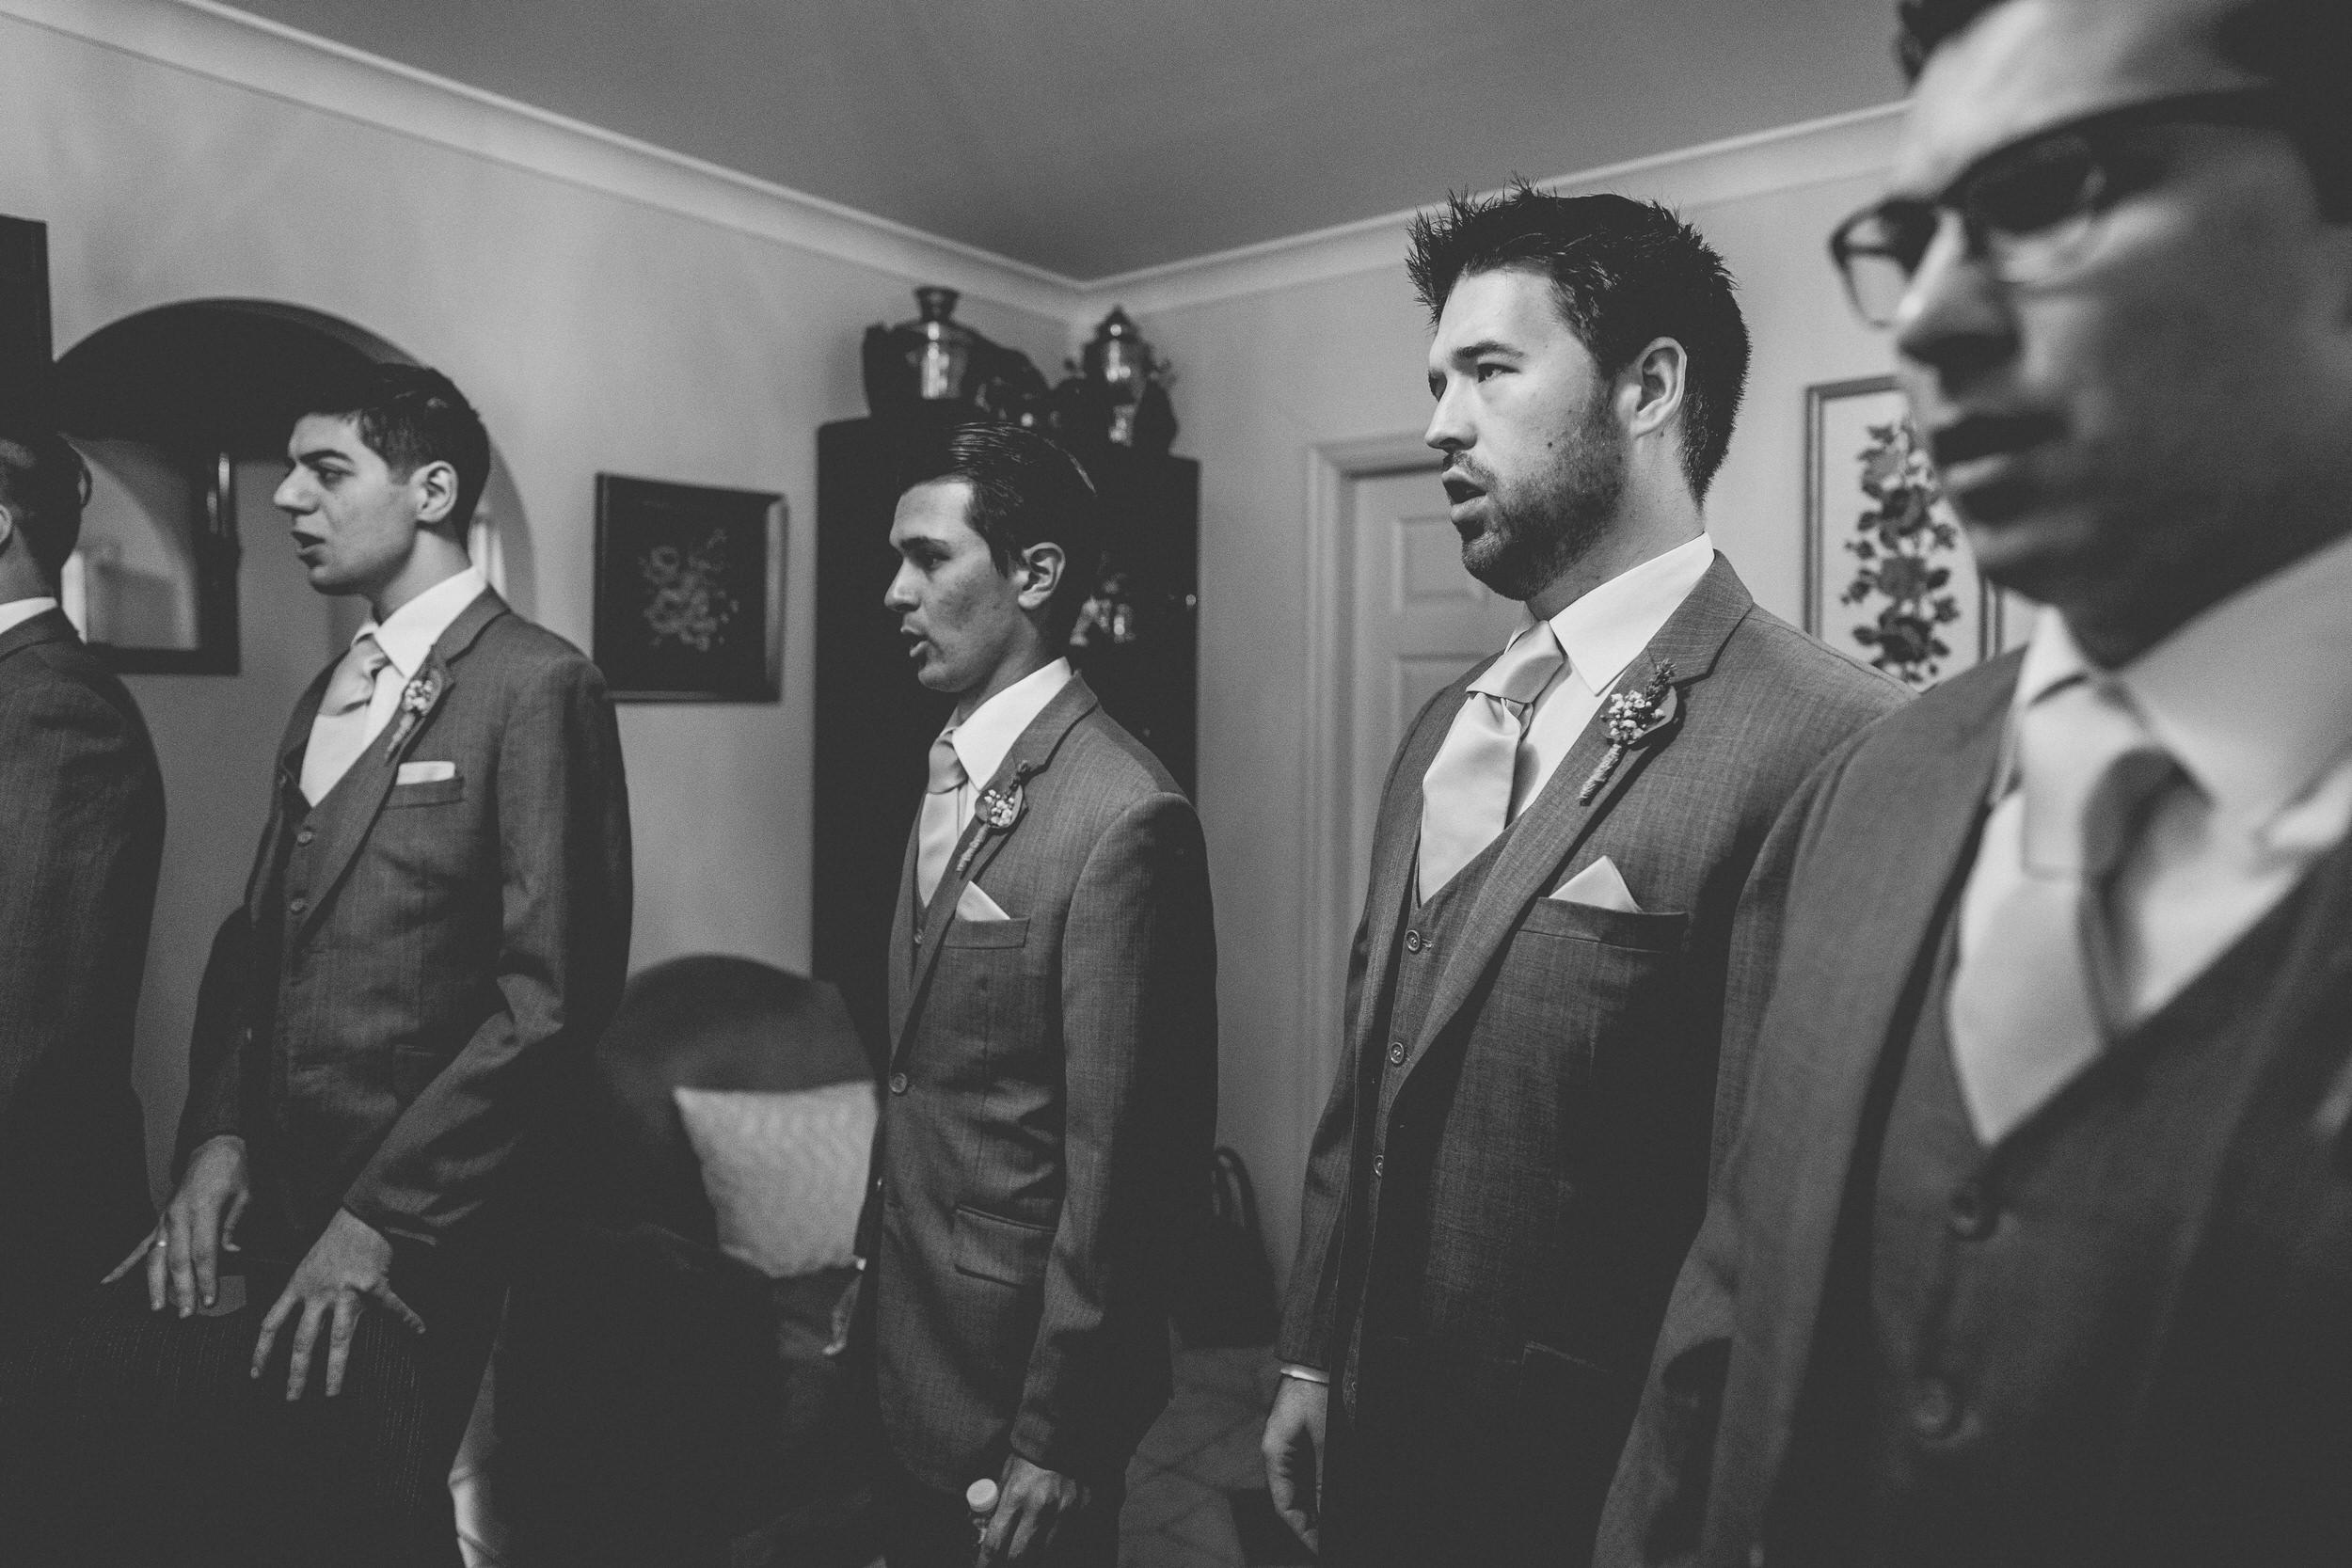 orthodox wedding customs